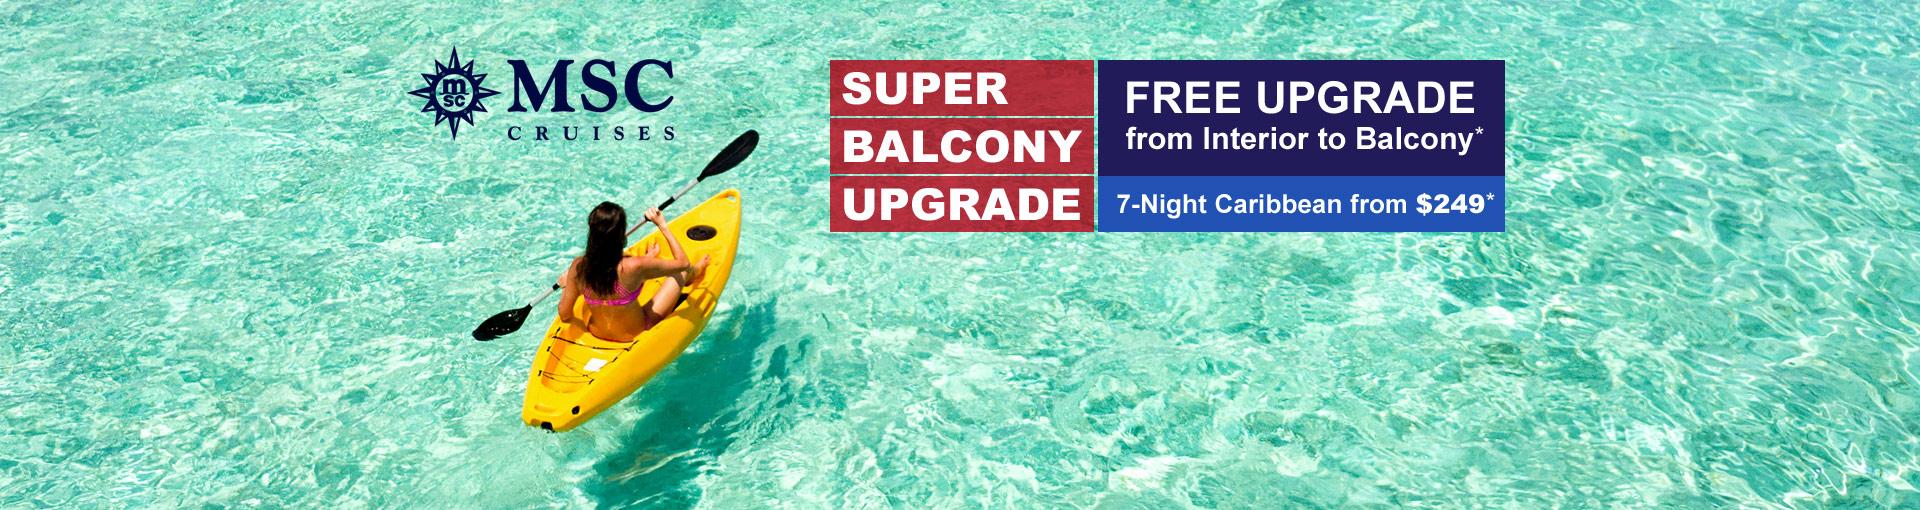 MSC Cruises - Super Balcony Upgrade Sale